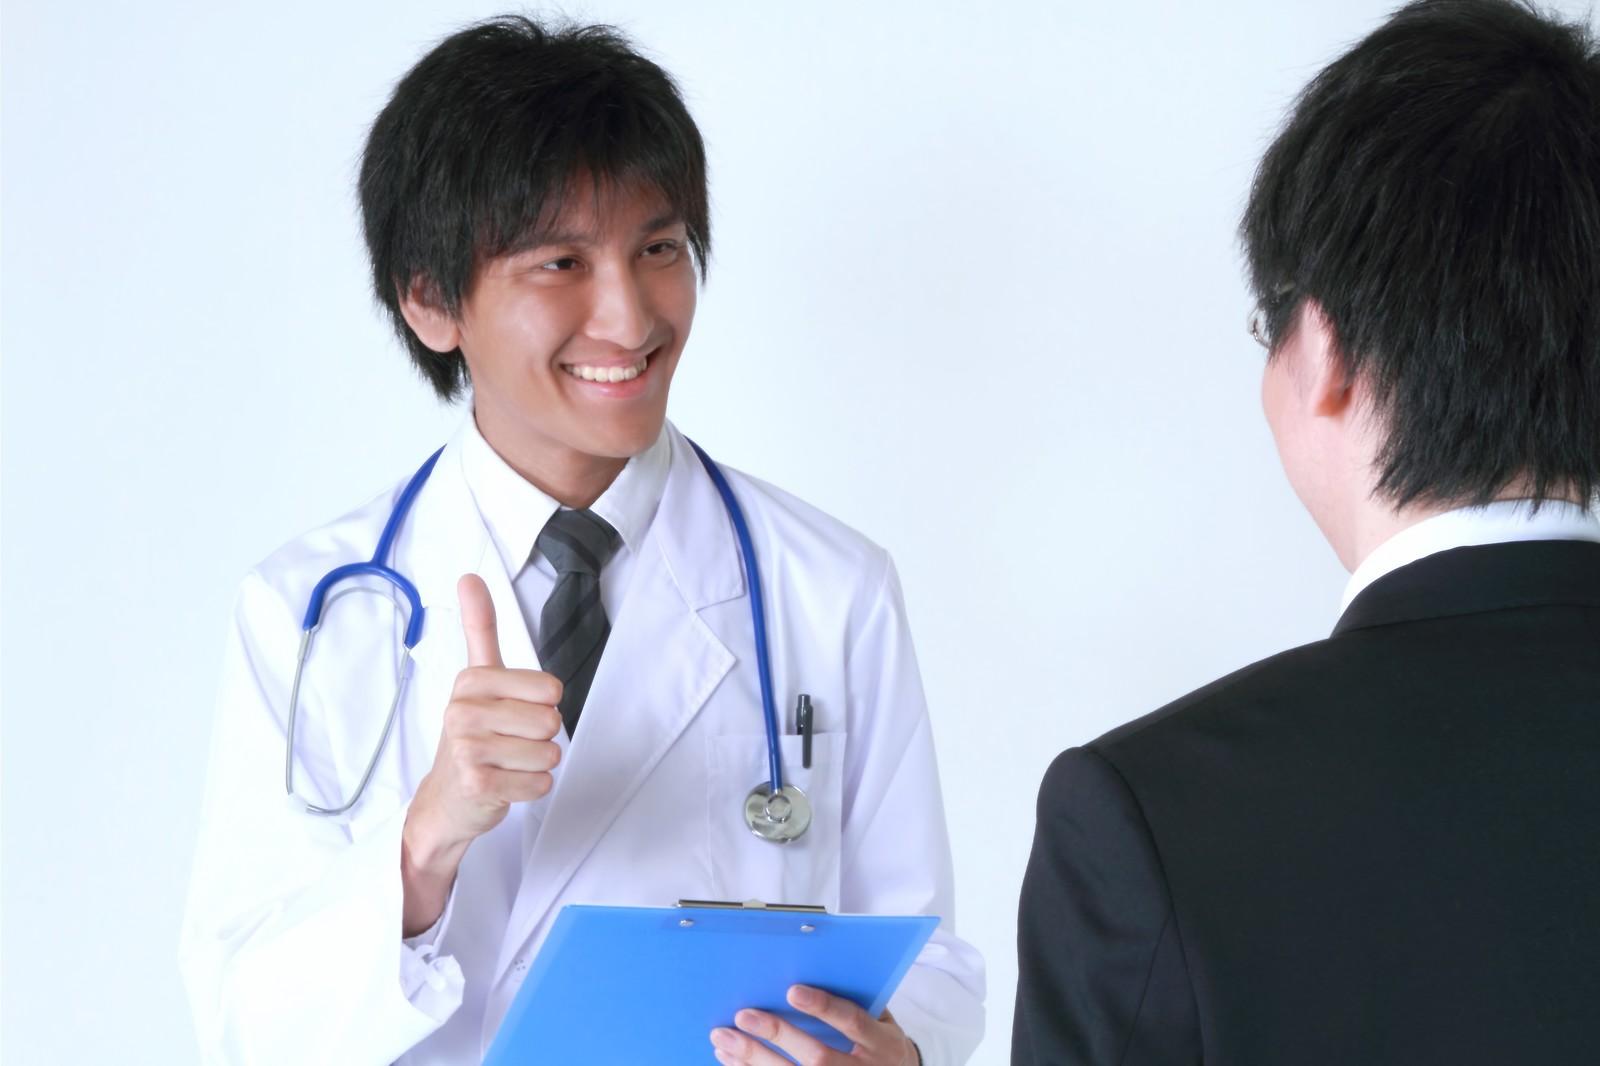 健康診断結果を報告